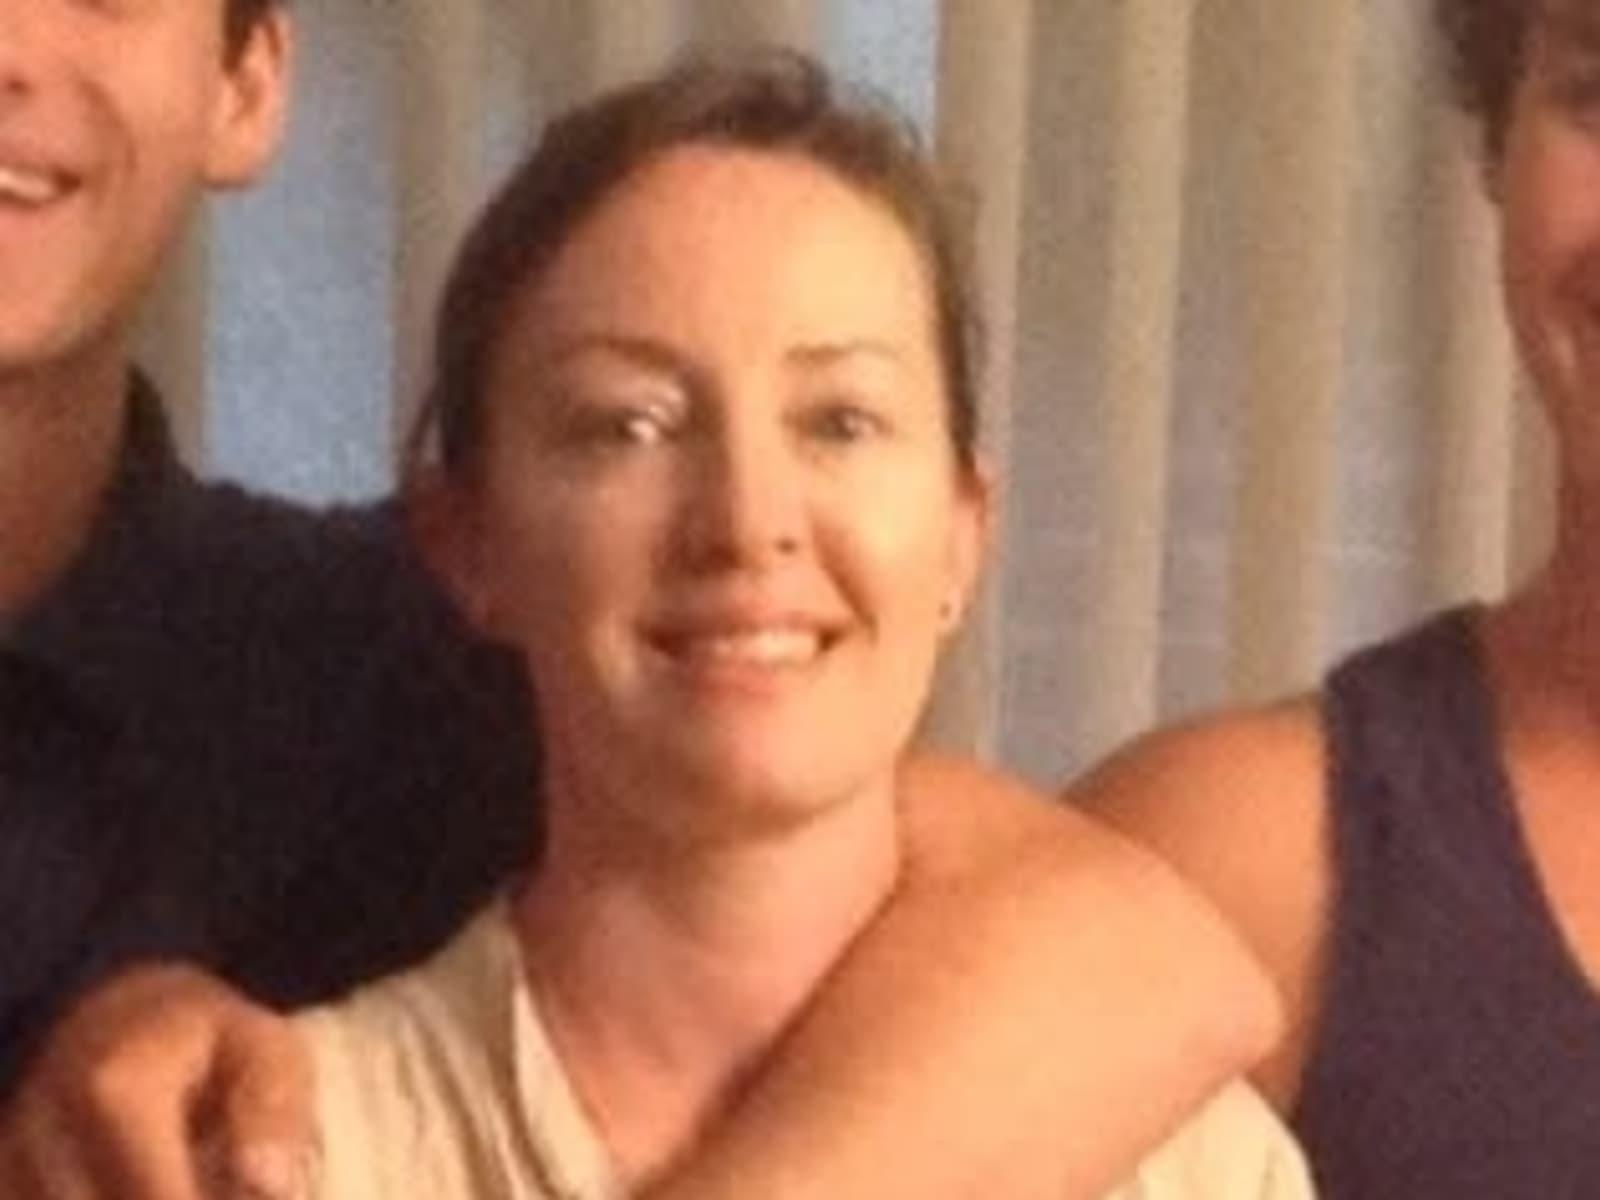 Leah from Perth, Western Australia, Australia